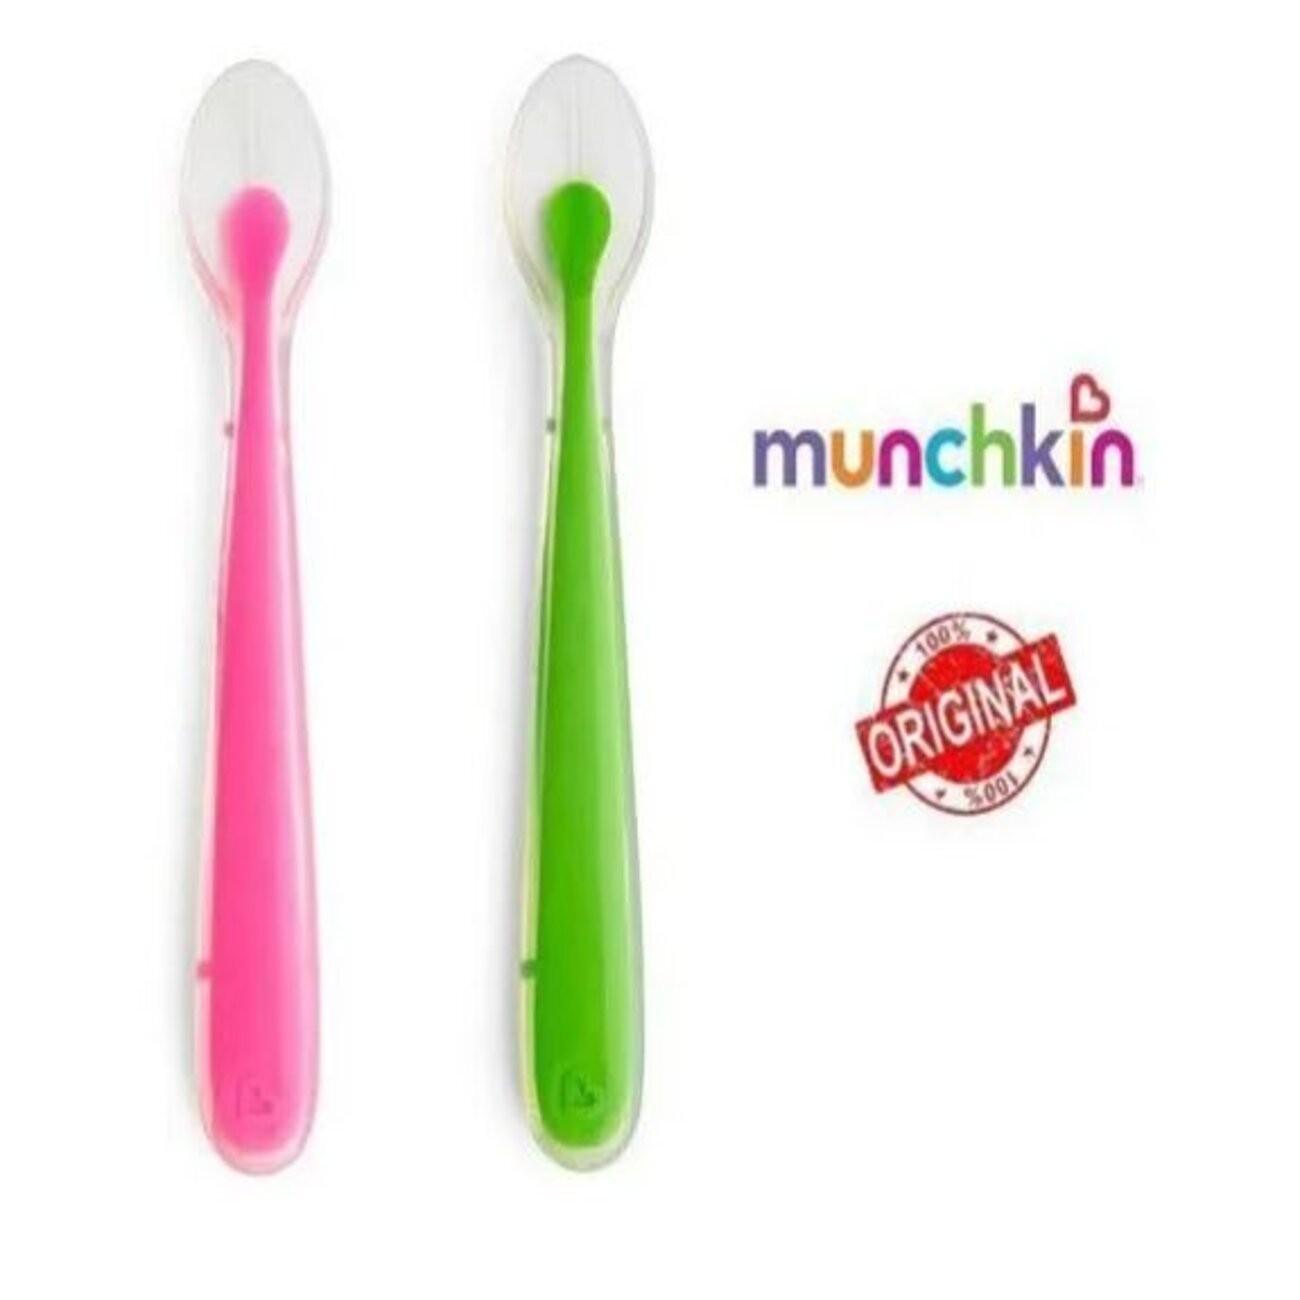 Colher de Silicone 2 unidades Rosa e Verde - Munchkin